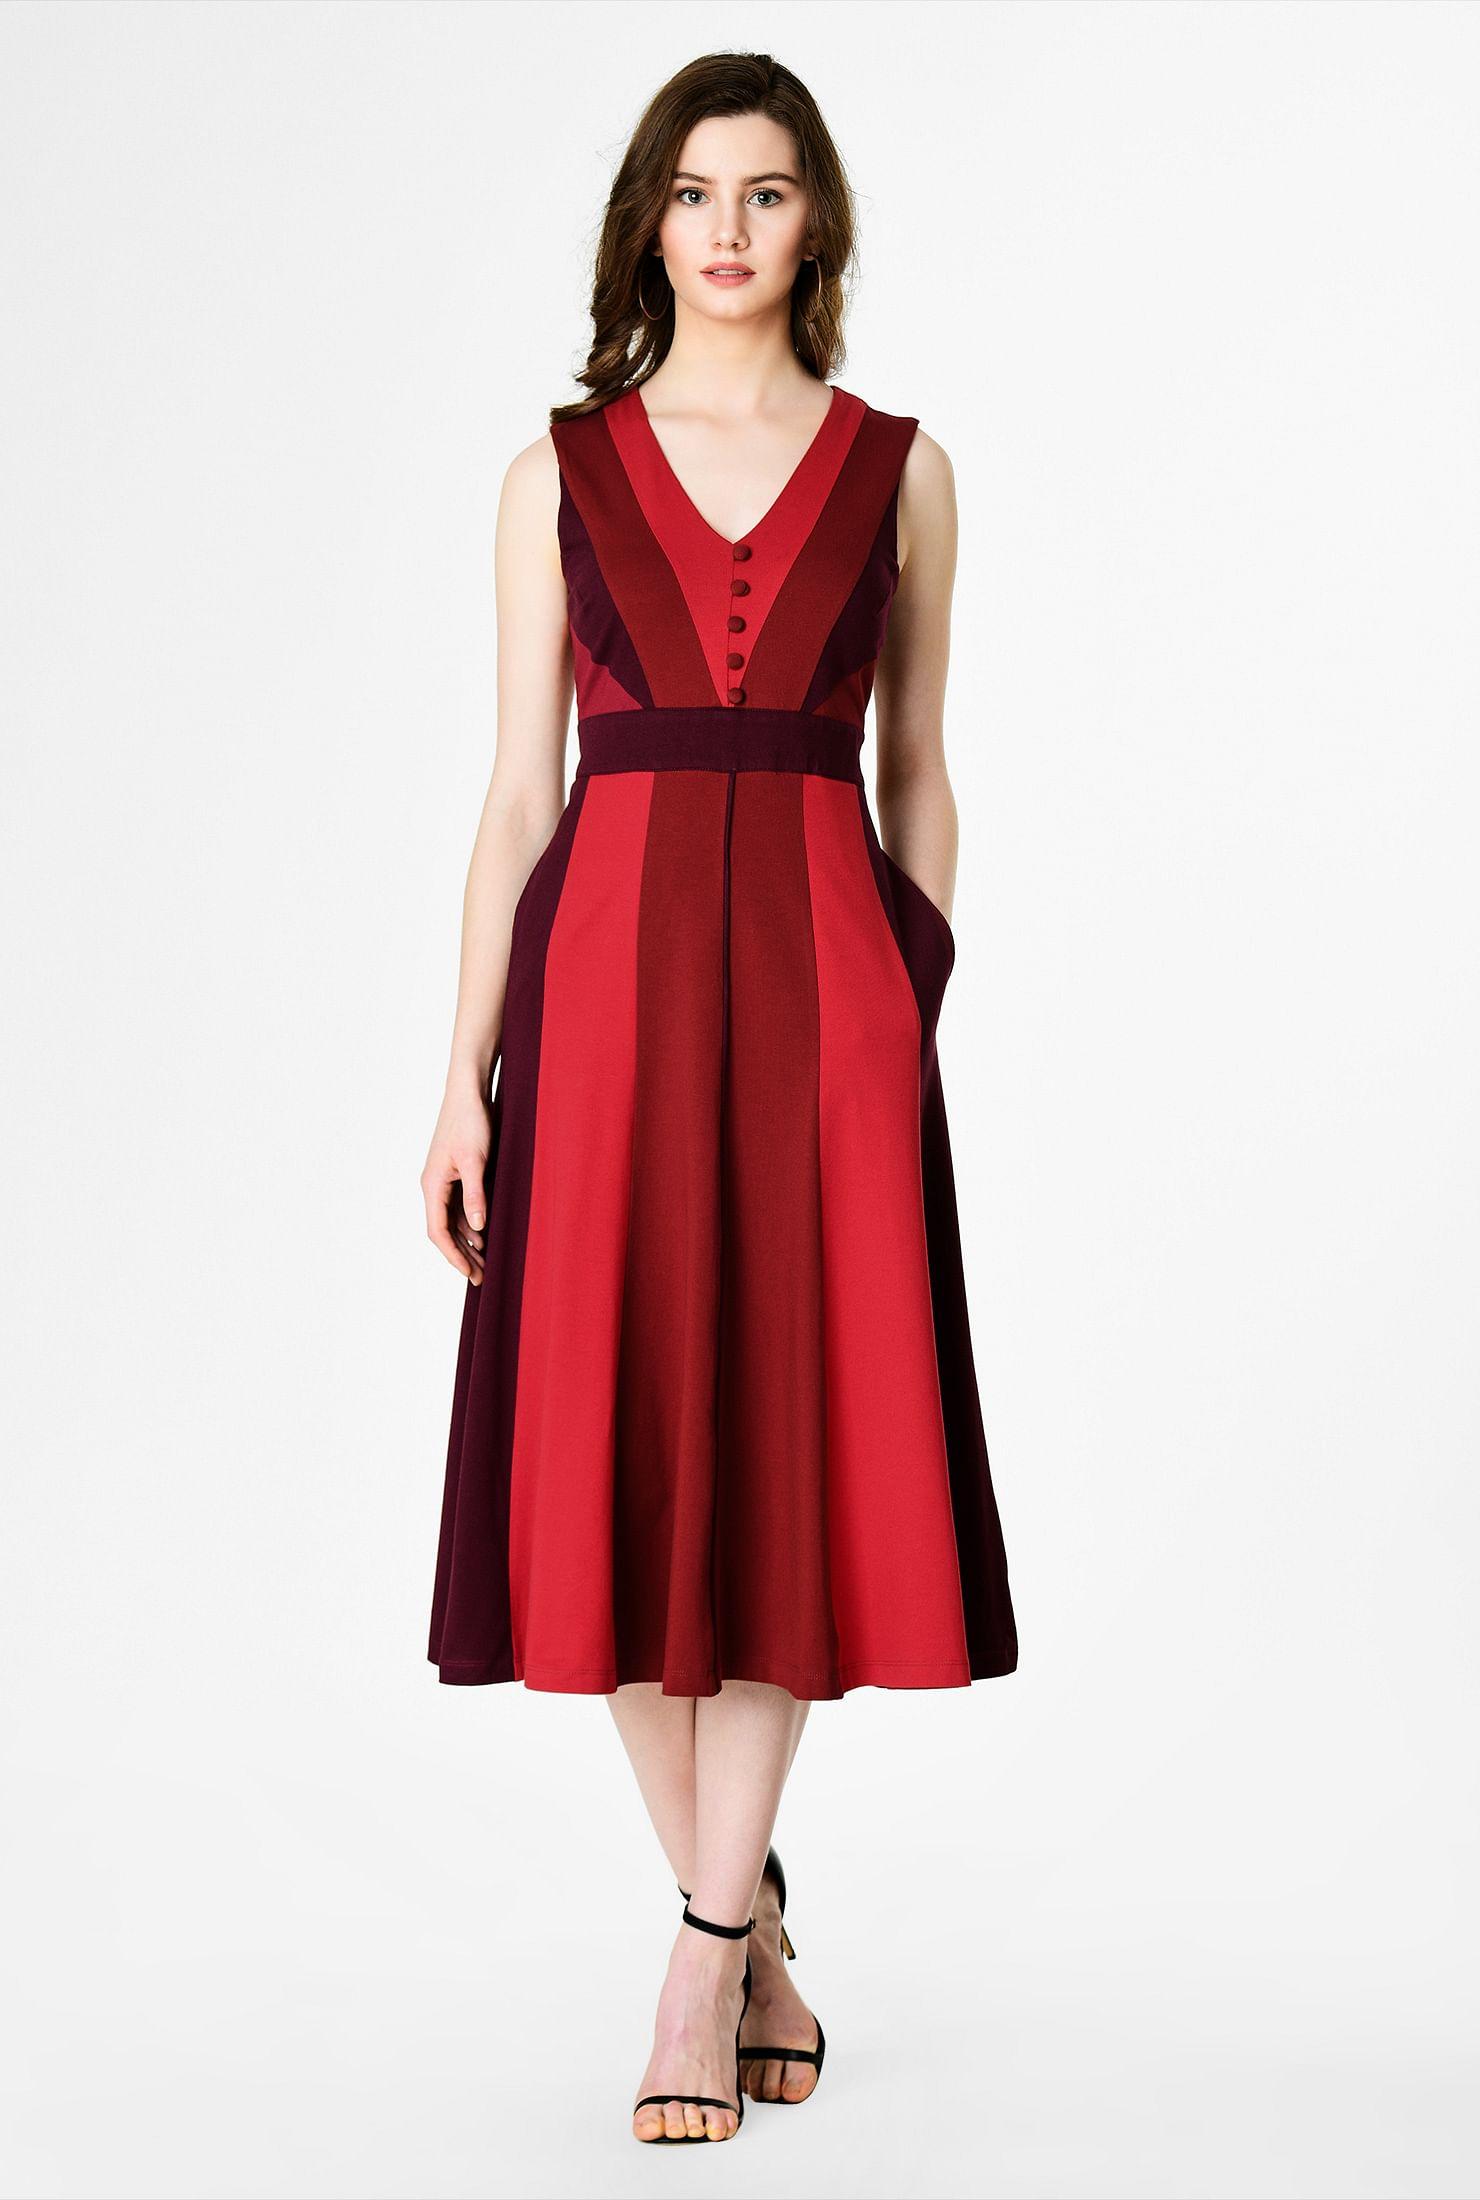 2f0f9ae92 all-size inclusive dresses, casual event dresses, petites, plus size dresses